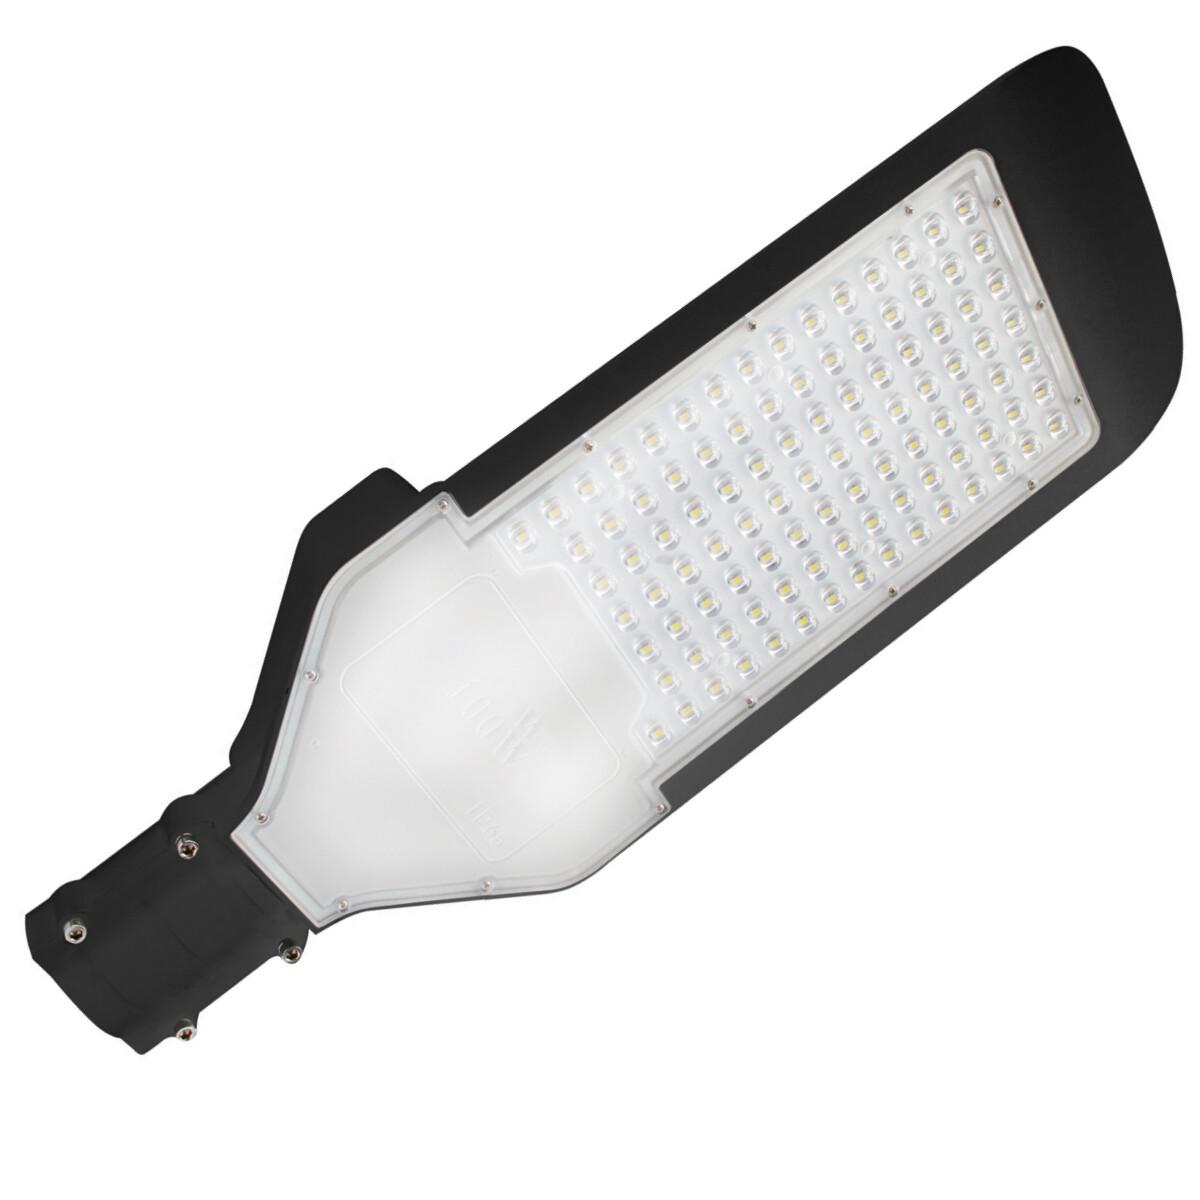 LED Straatlamp - Orny - 100W - Helder/Koud Wit 6400K - Waterdicht IP65 - Mat Zwart - Aluminium